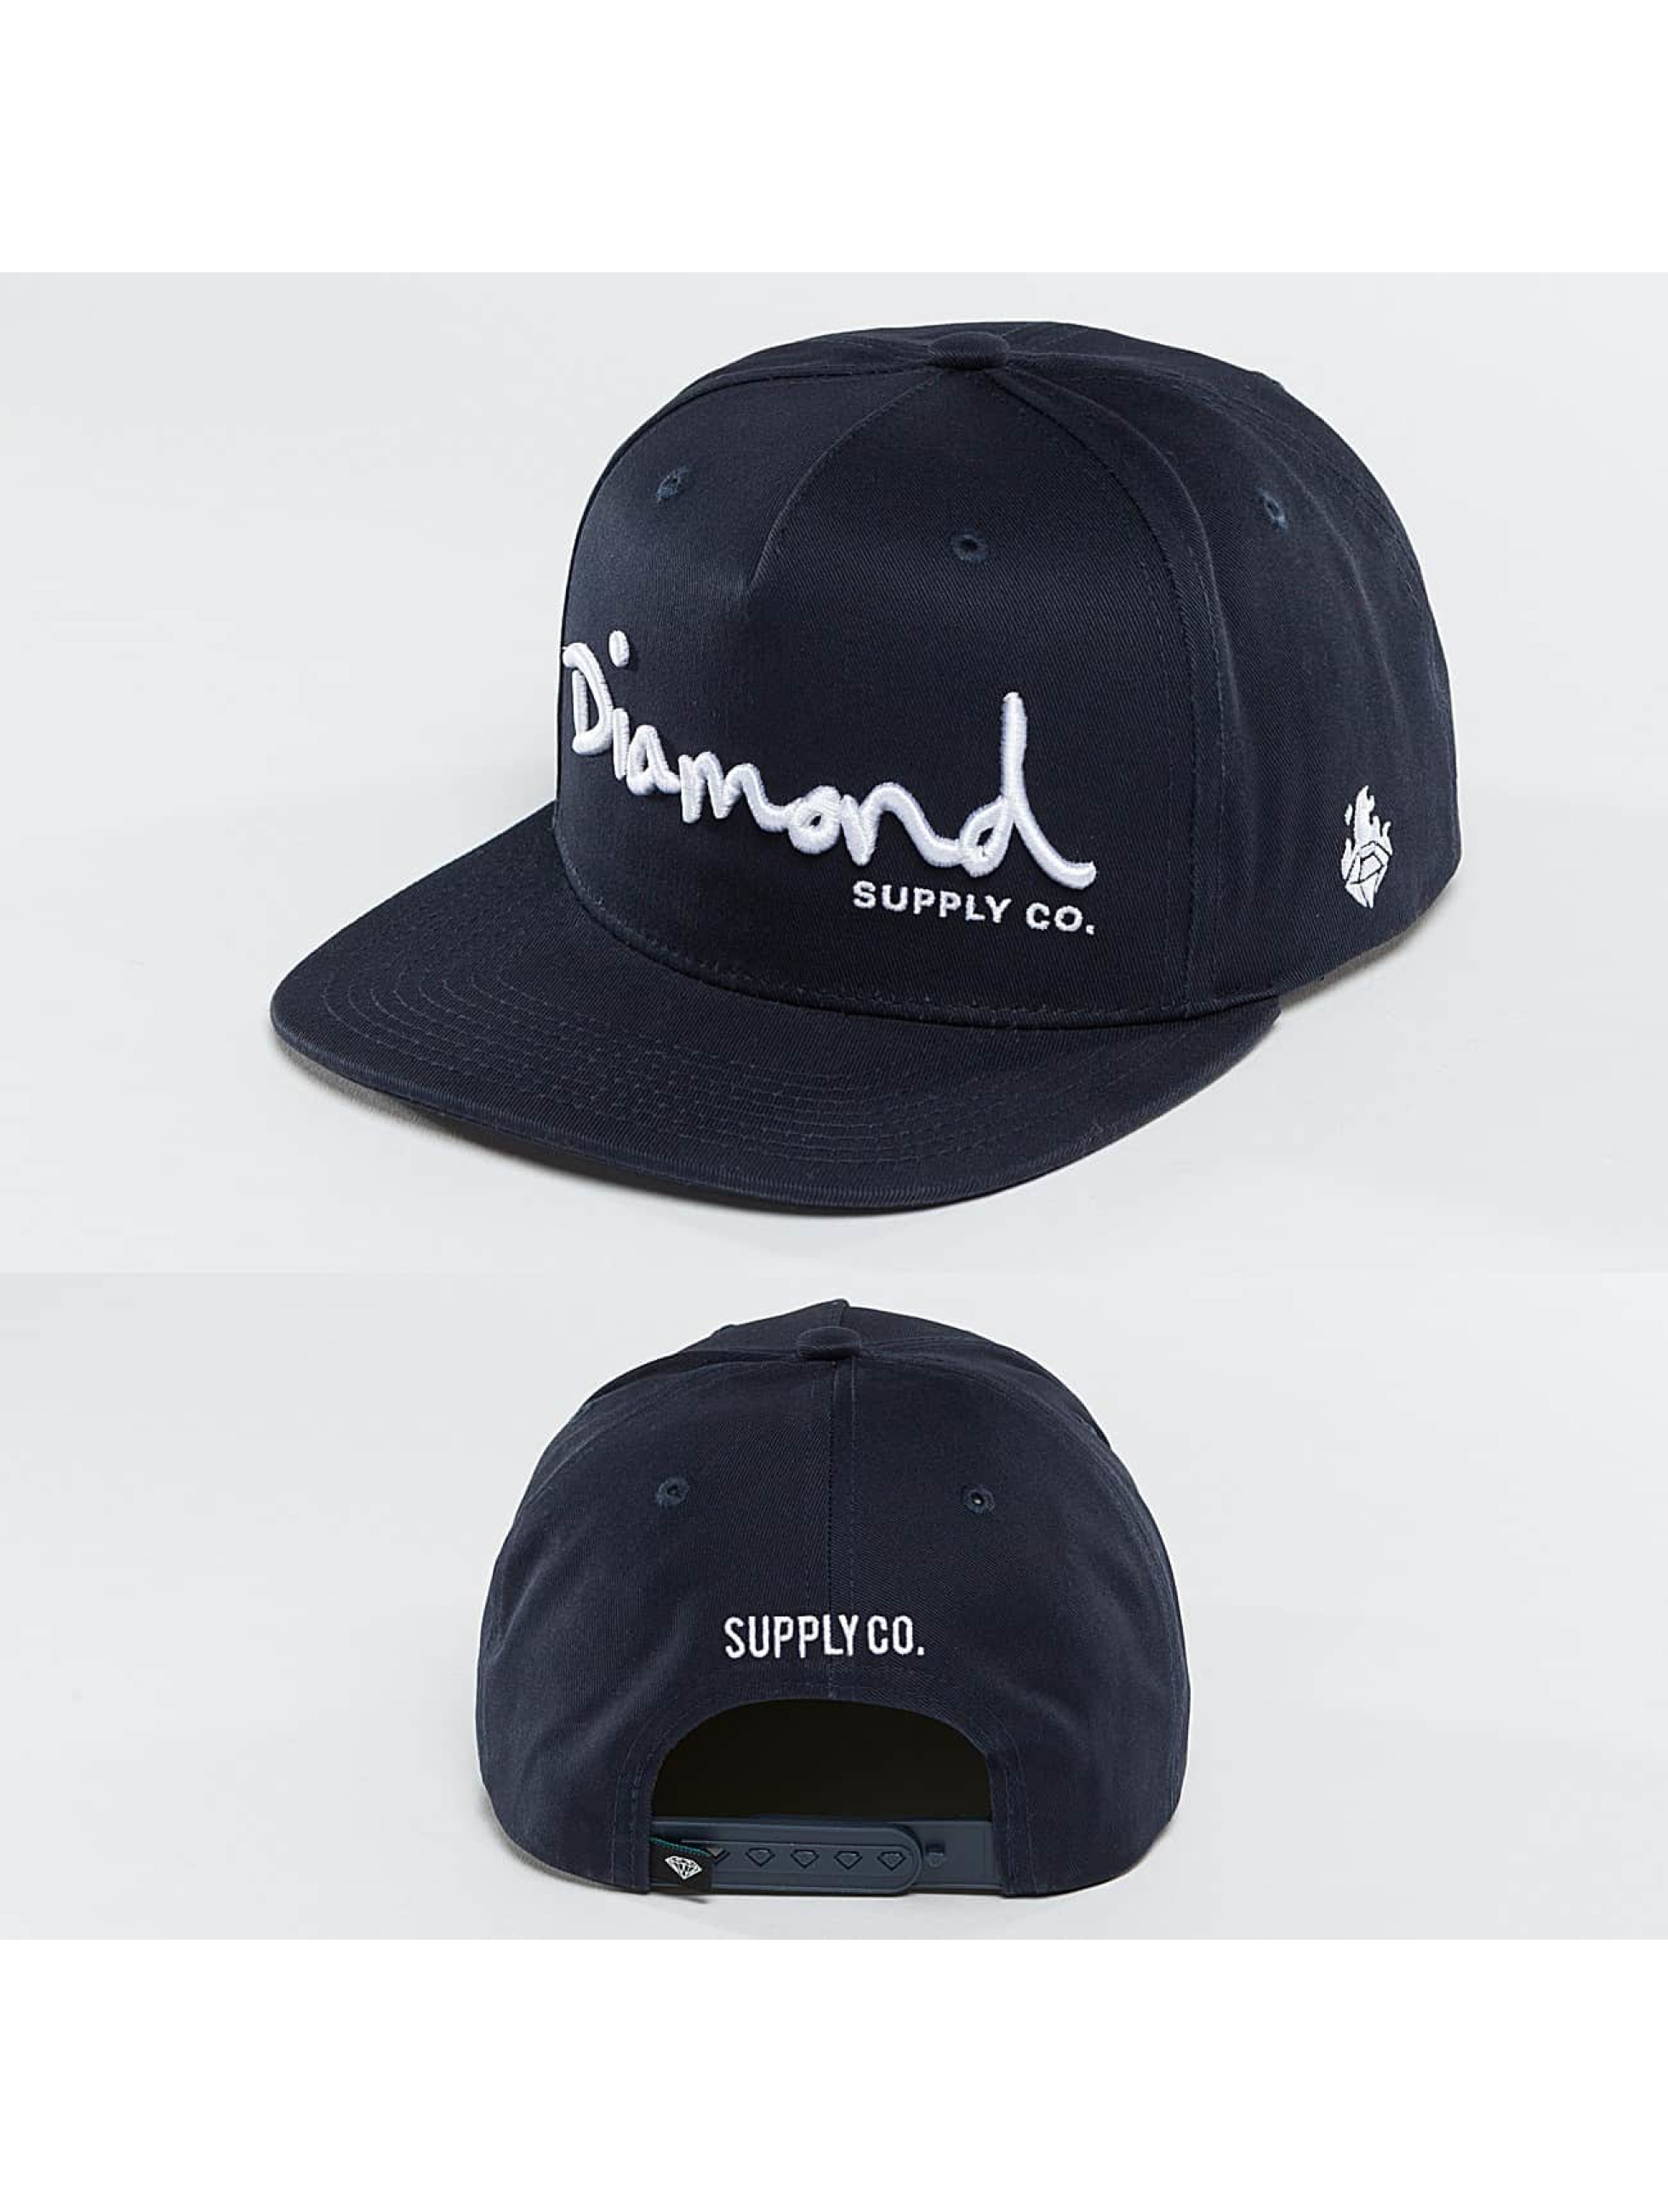 Diamond Männer,Frauen Snapback Cap OG Script in blau